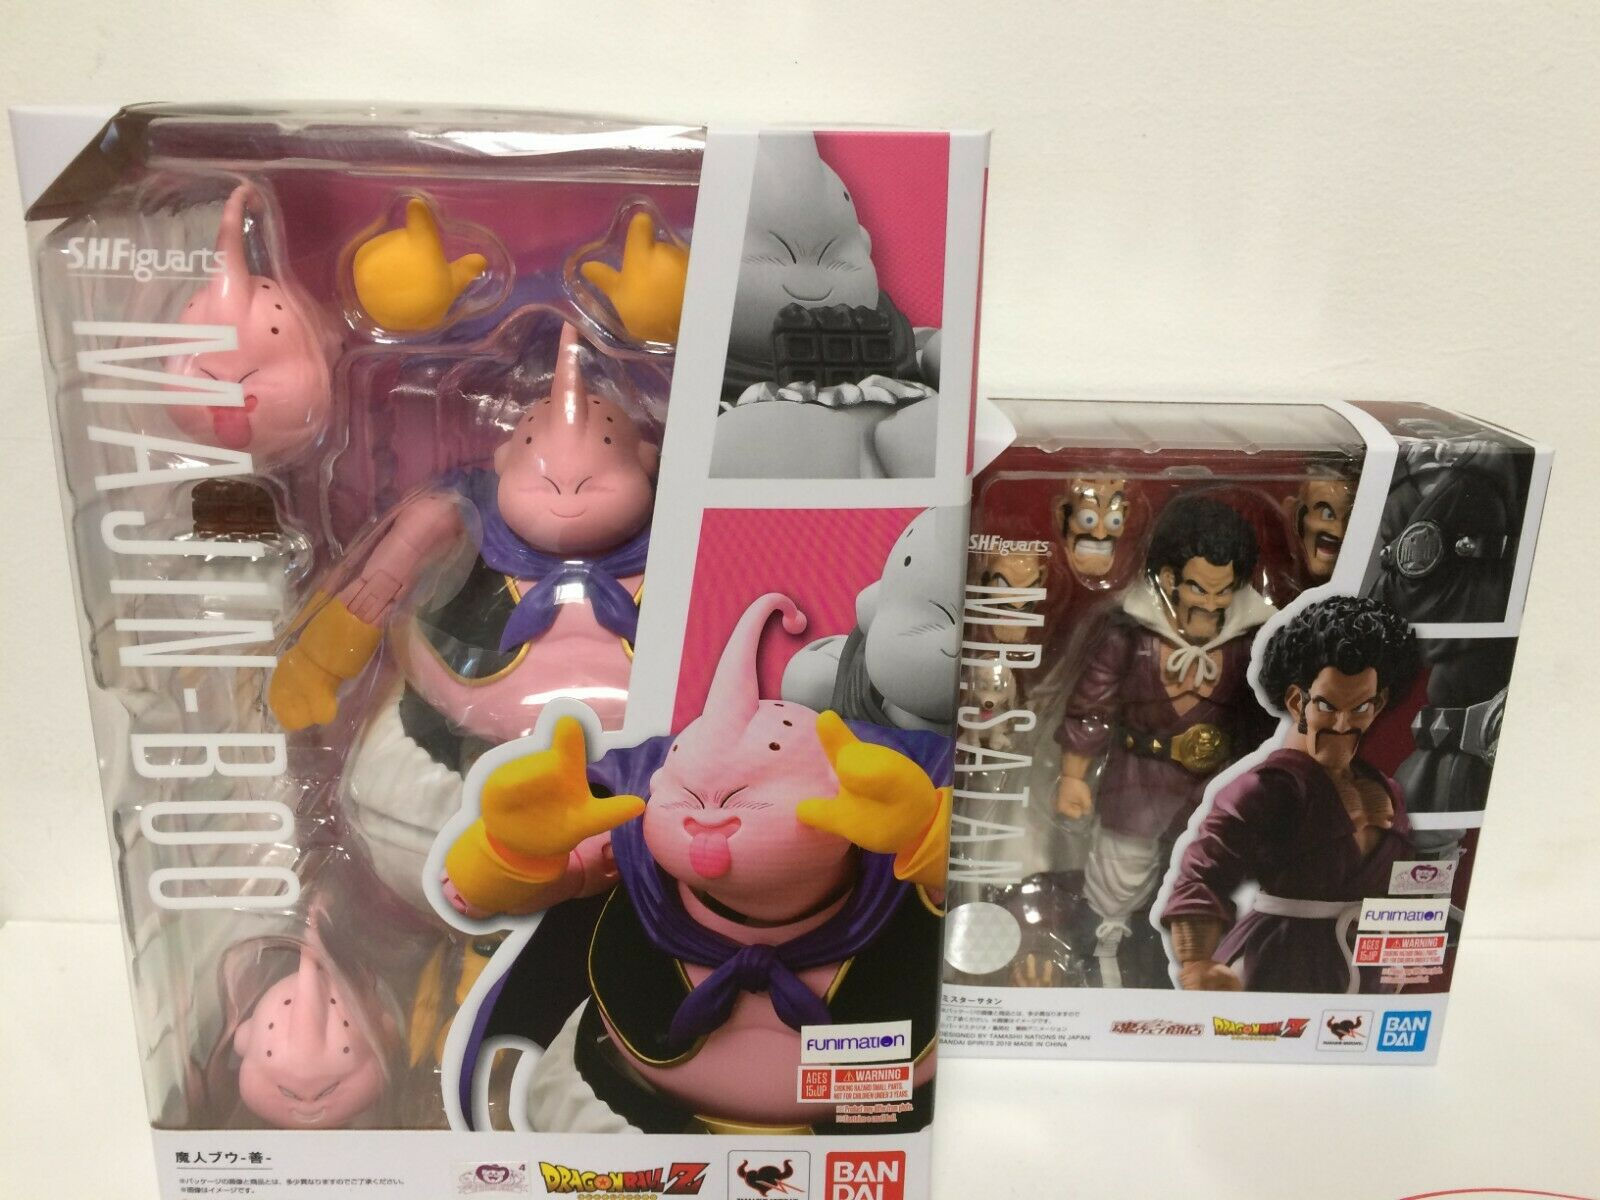 2-SET nuovo  Beai Tamashii S.H Figuarts Dragonbtutti Z Majin Boo Buu + MR SATAN  negozio online